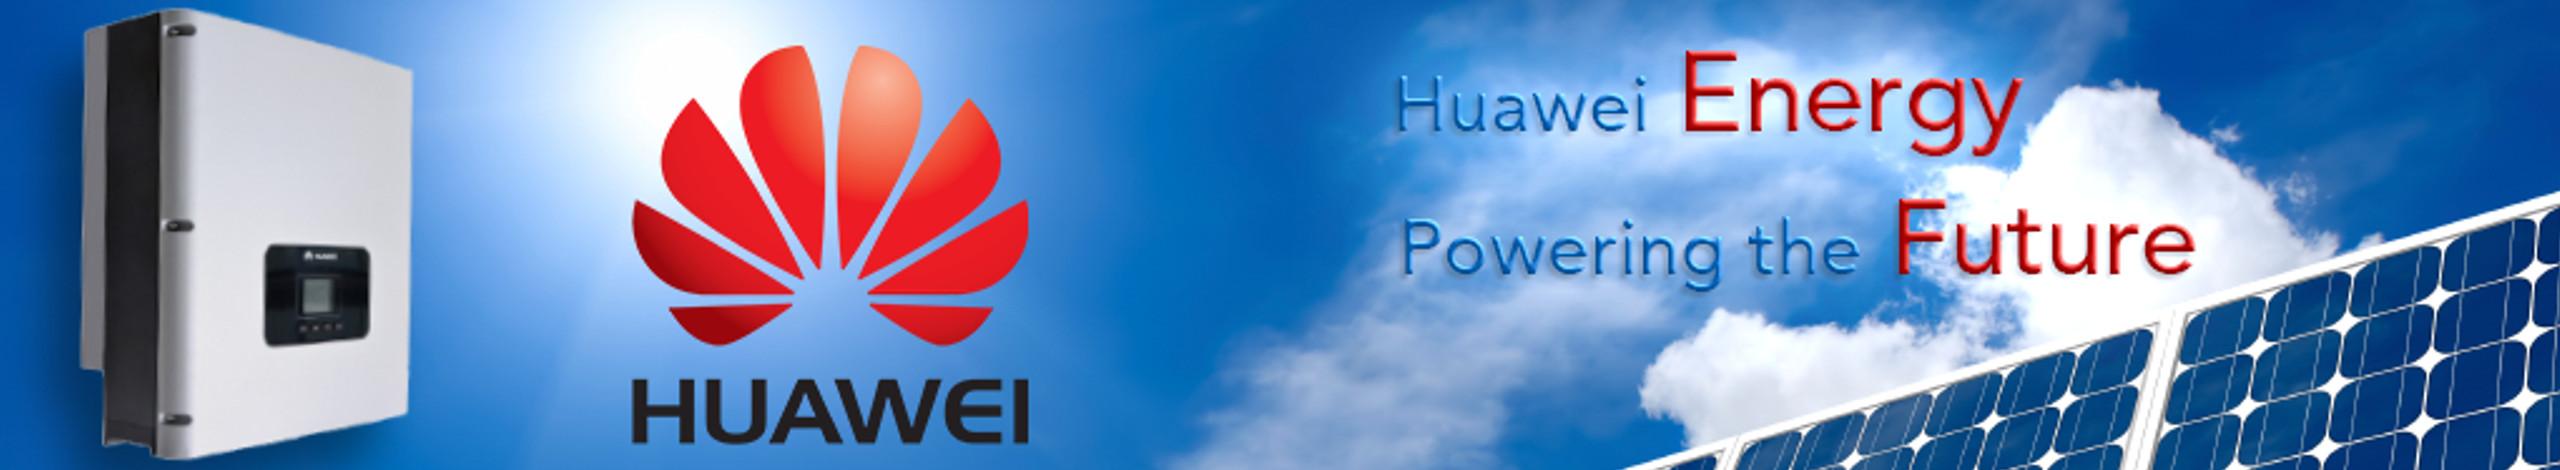 Huawei-slider-banner